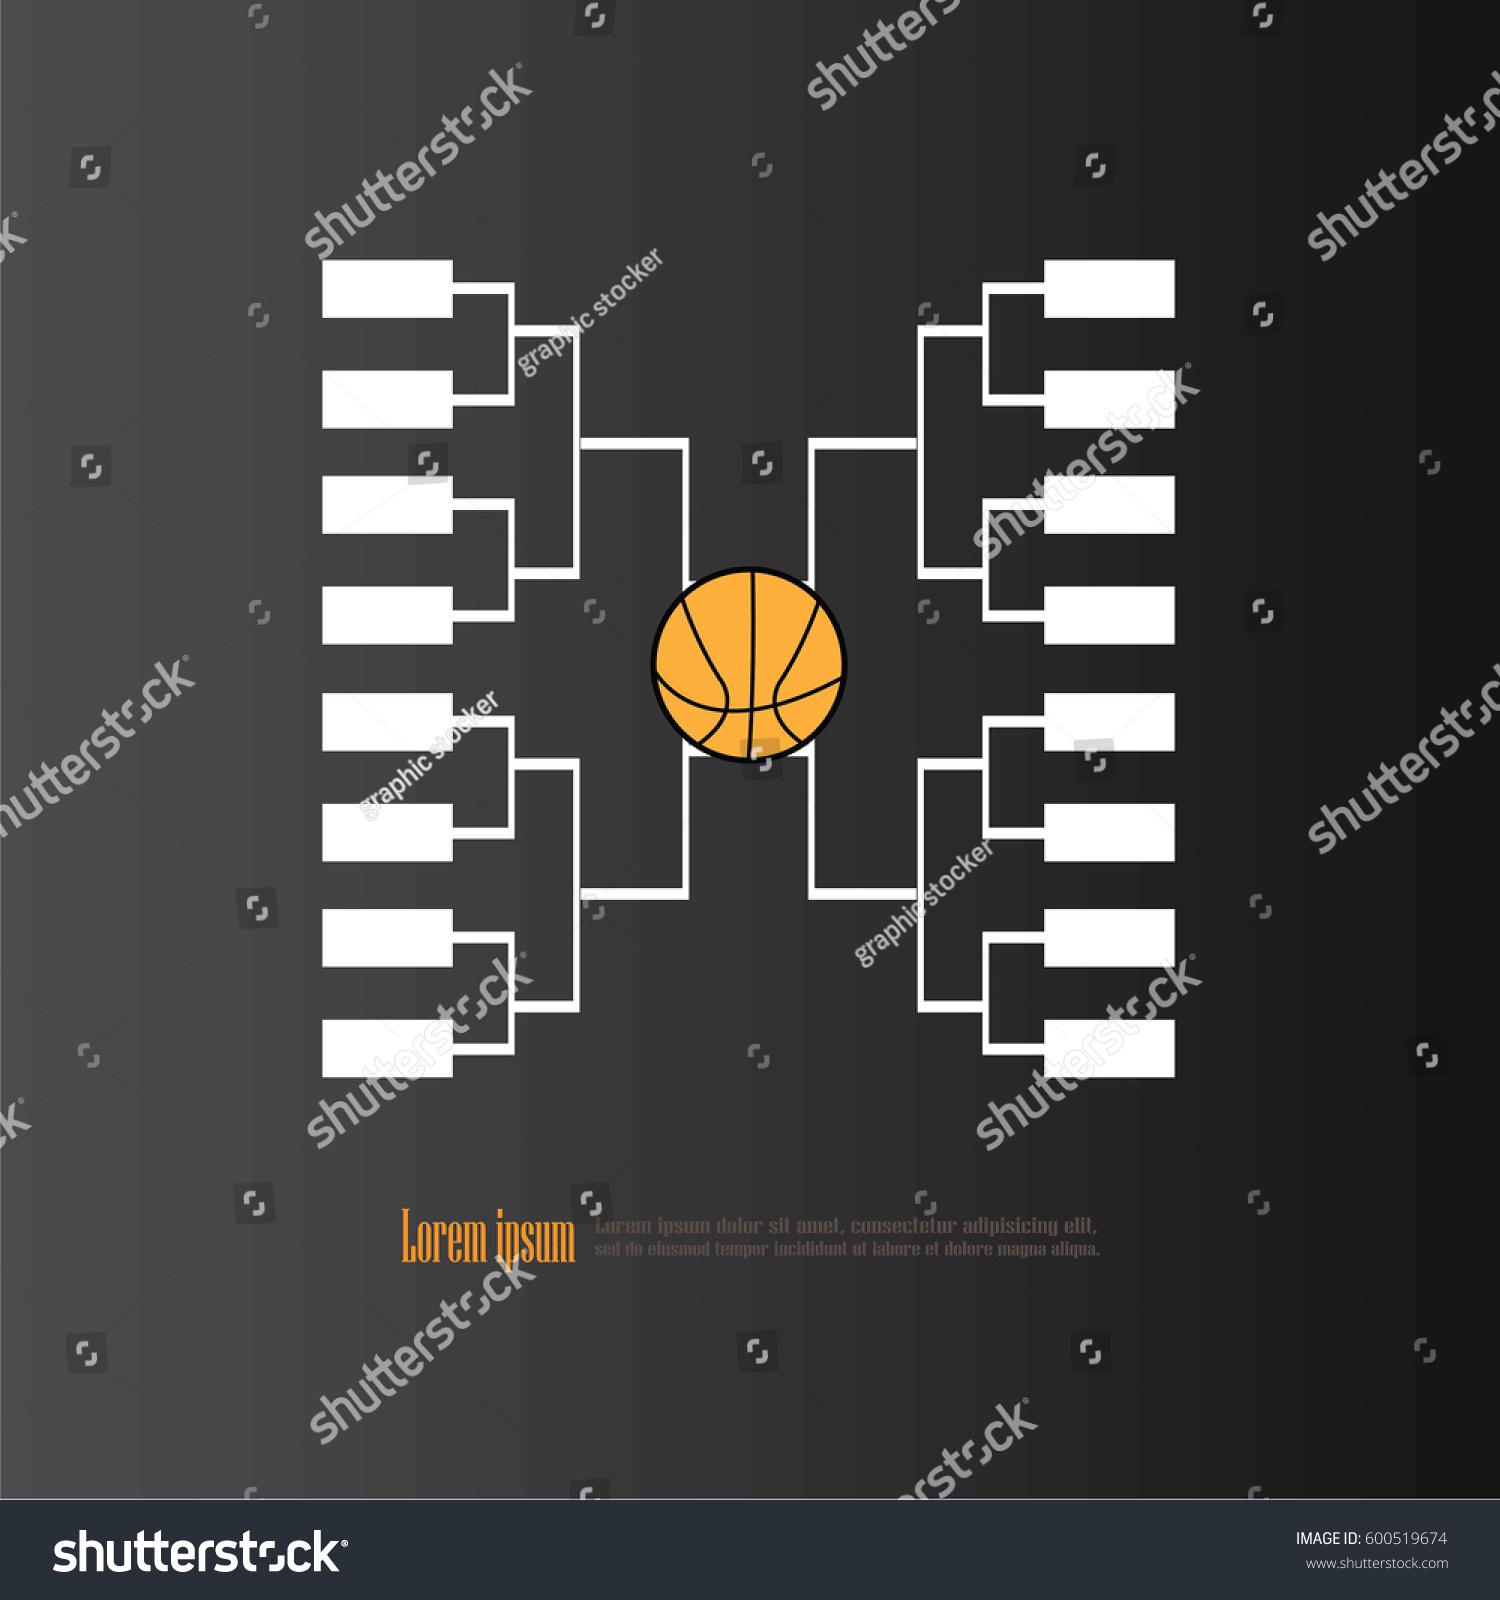 Blank Basketball Tournament Bracket On Chalkboardvector Stock Vector